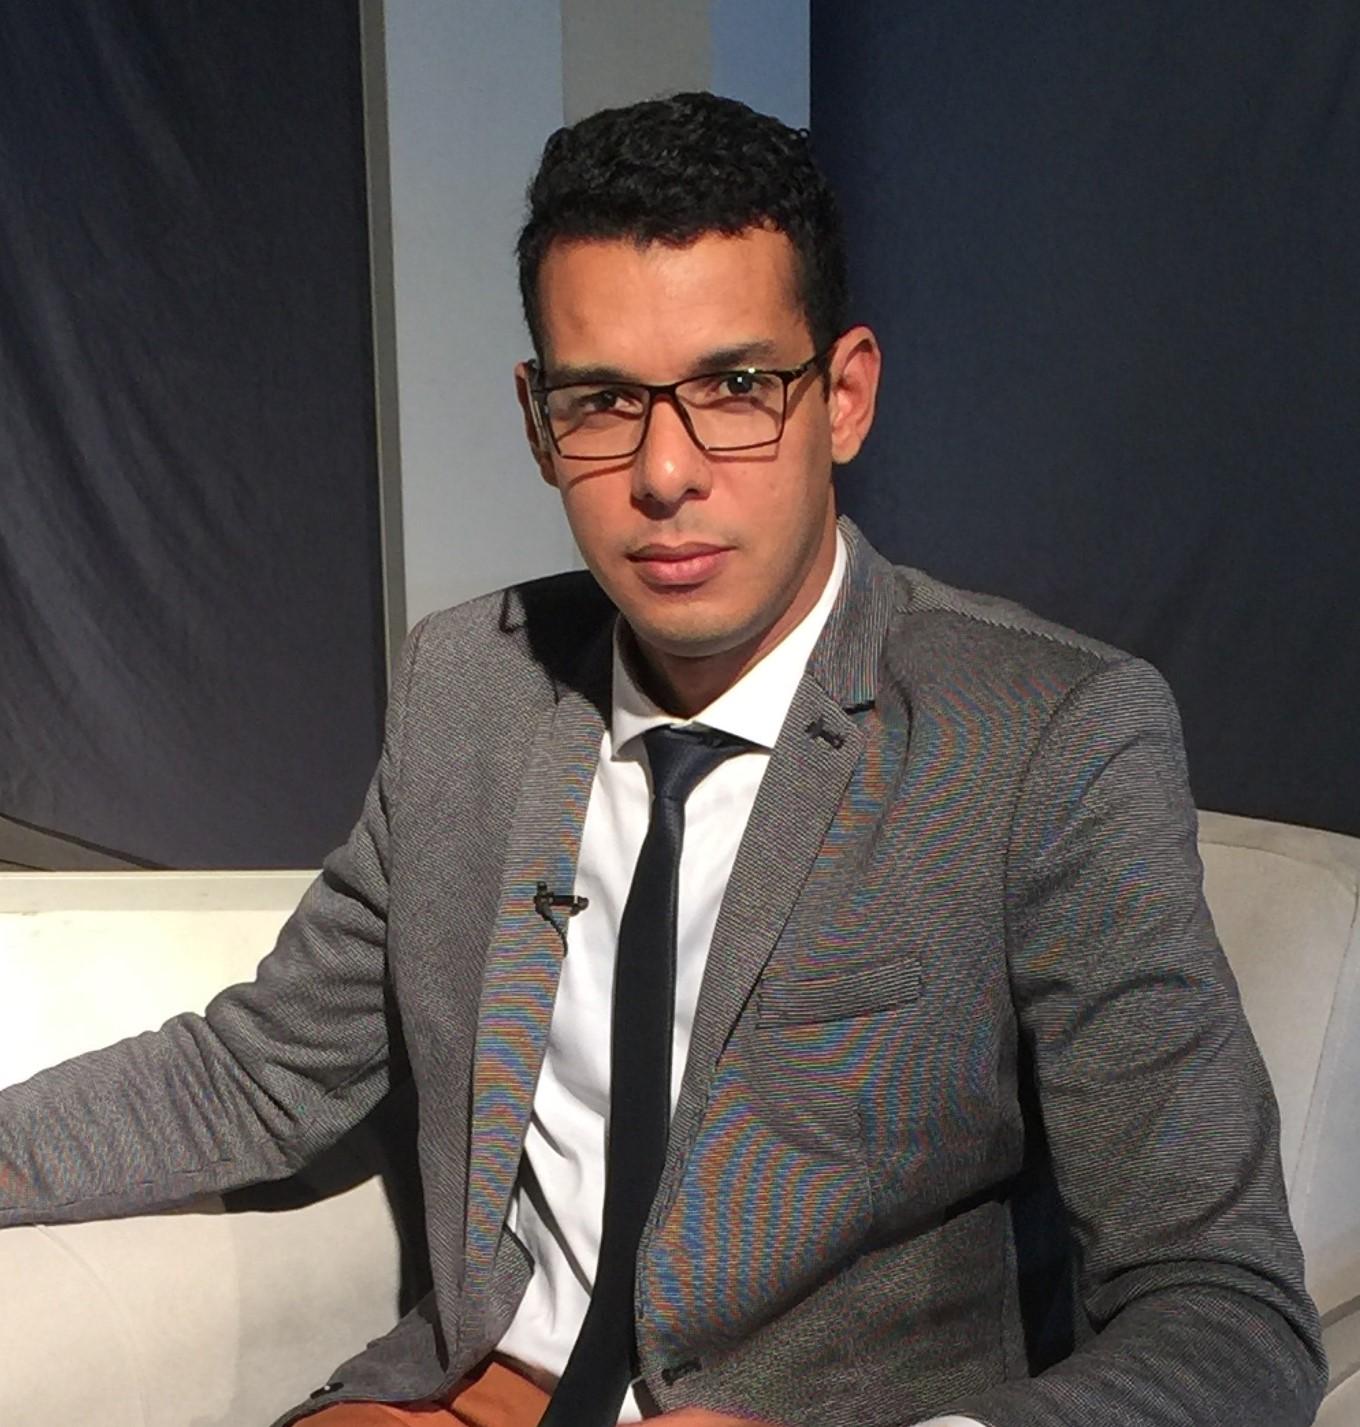 محمد ناجي: صحفي